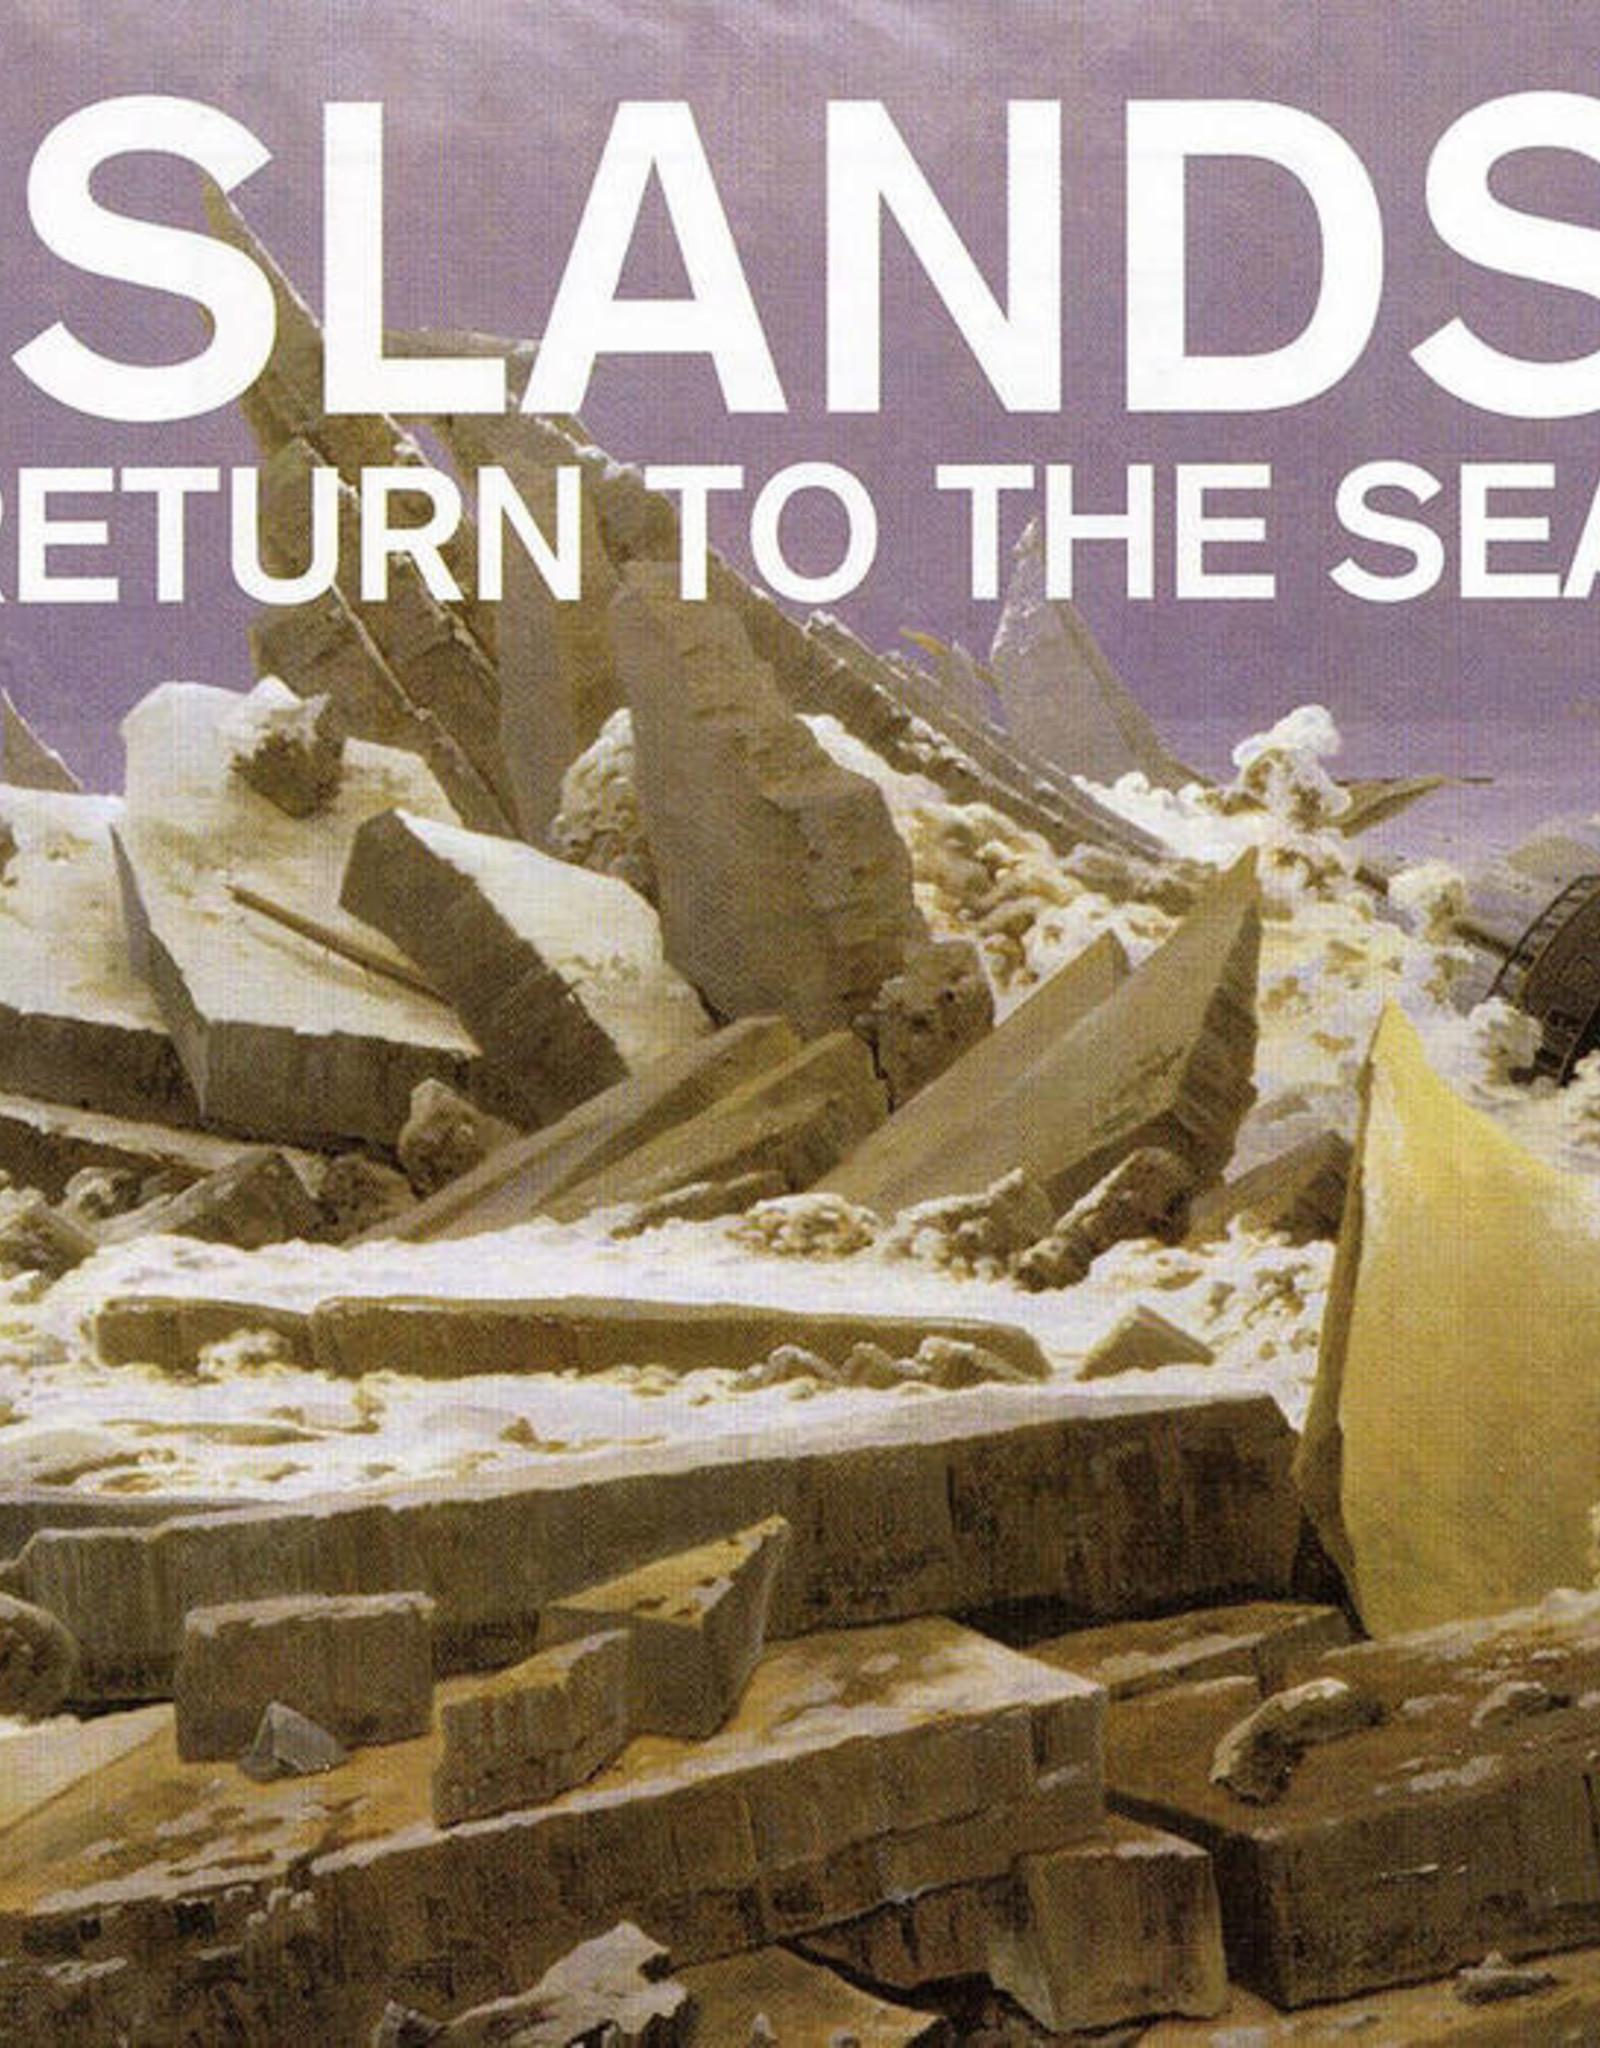 Islands - Return to the Sea (10th Anniversary)